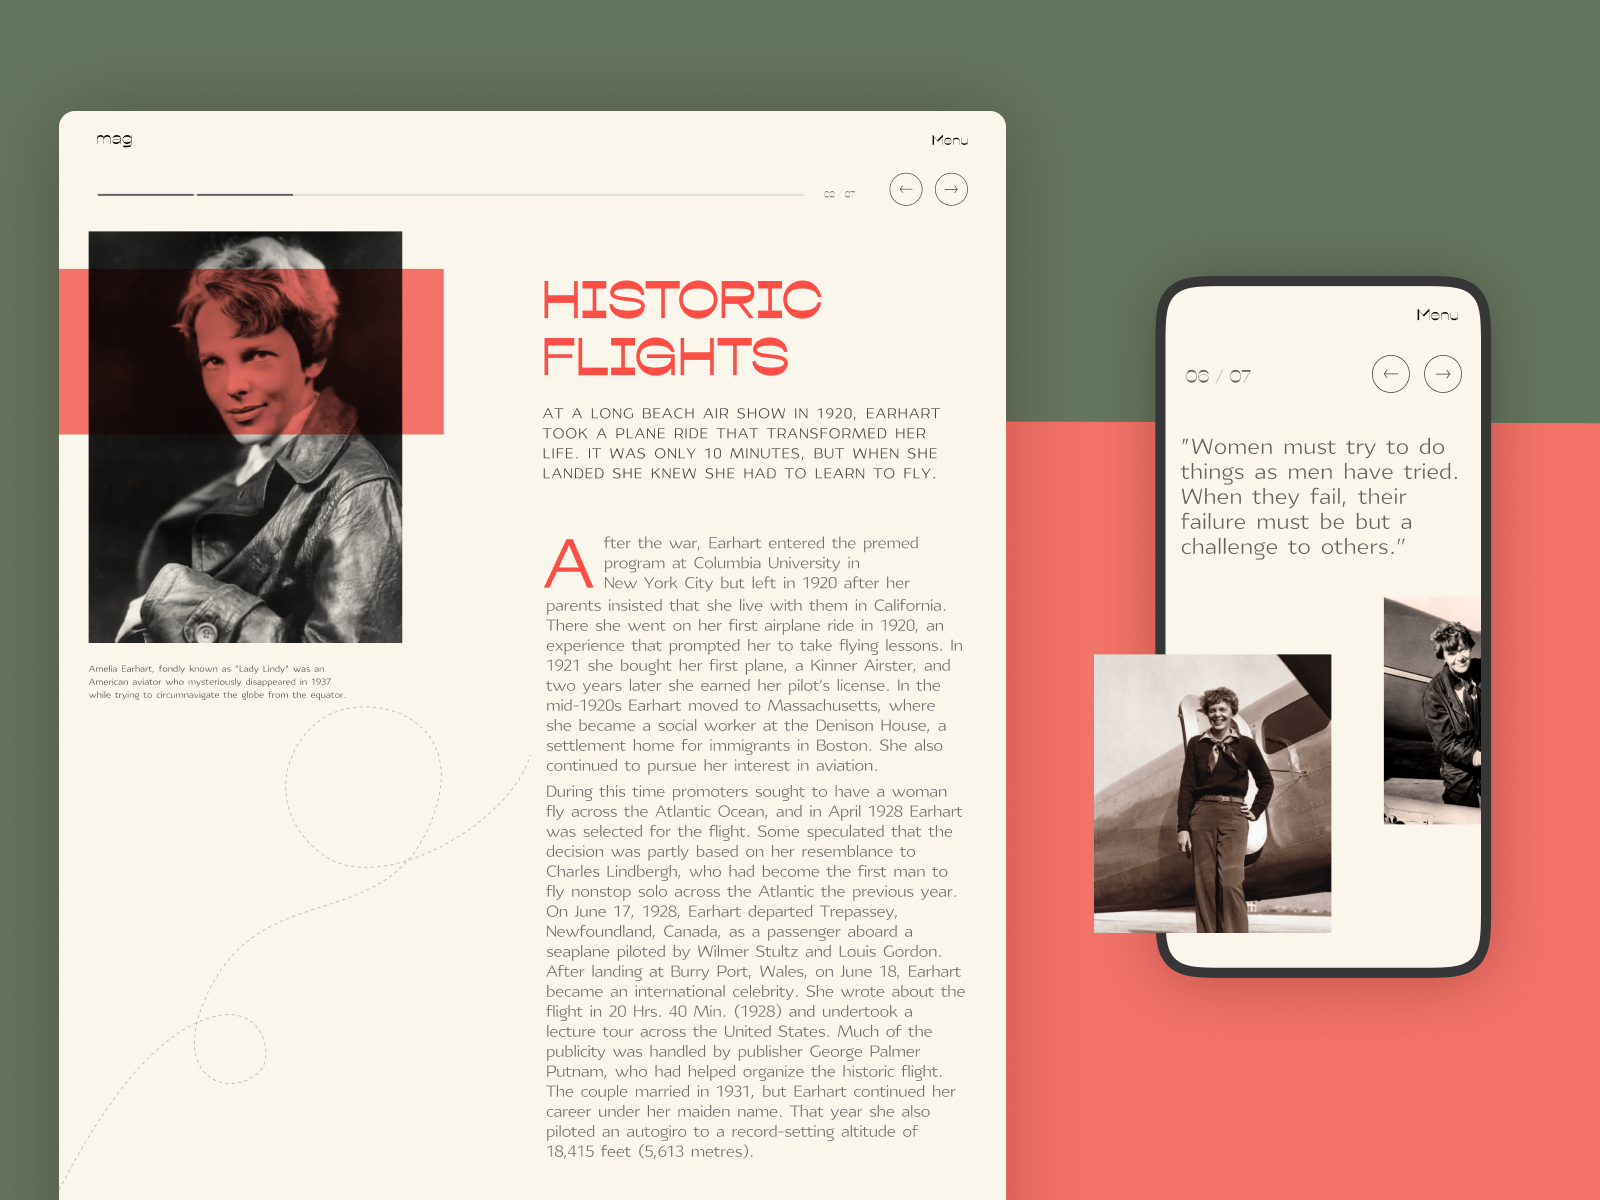 powerful women stories website tubik studio